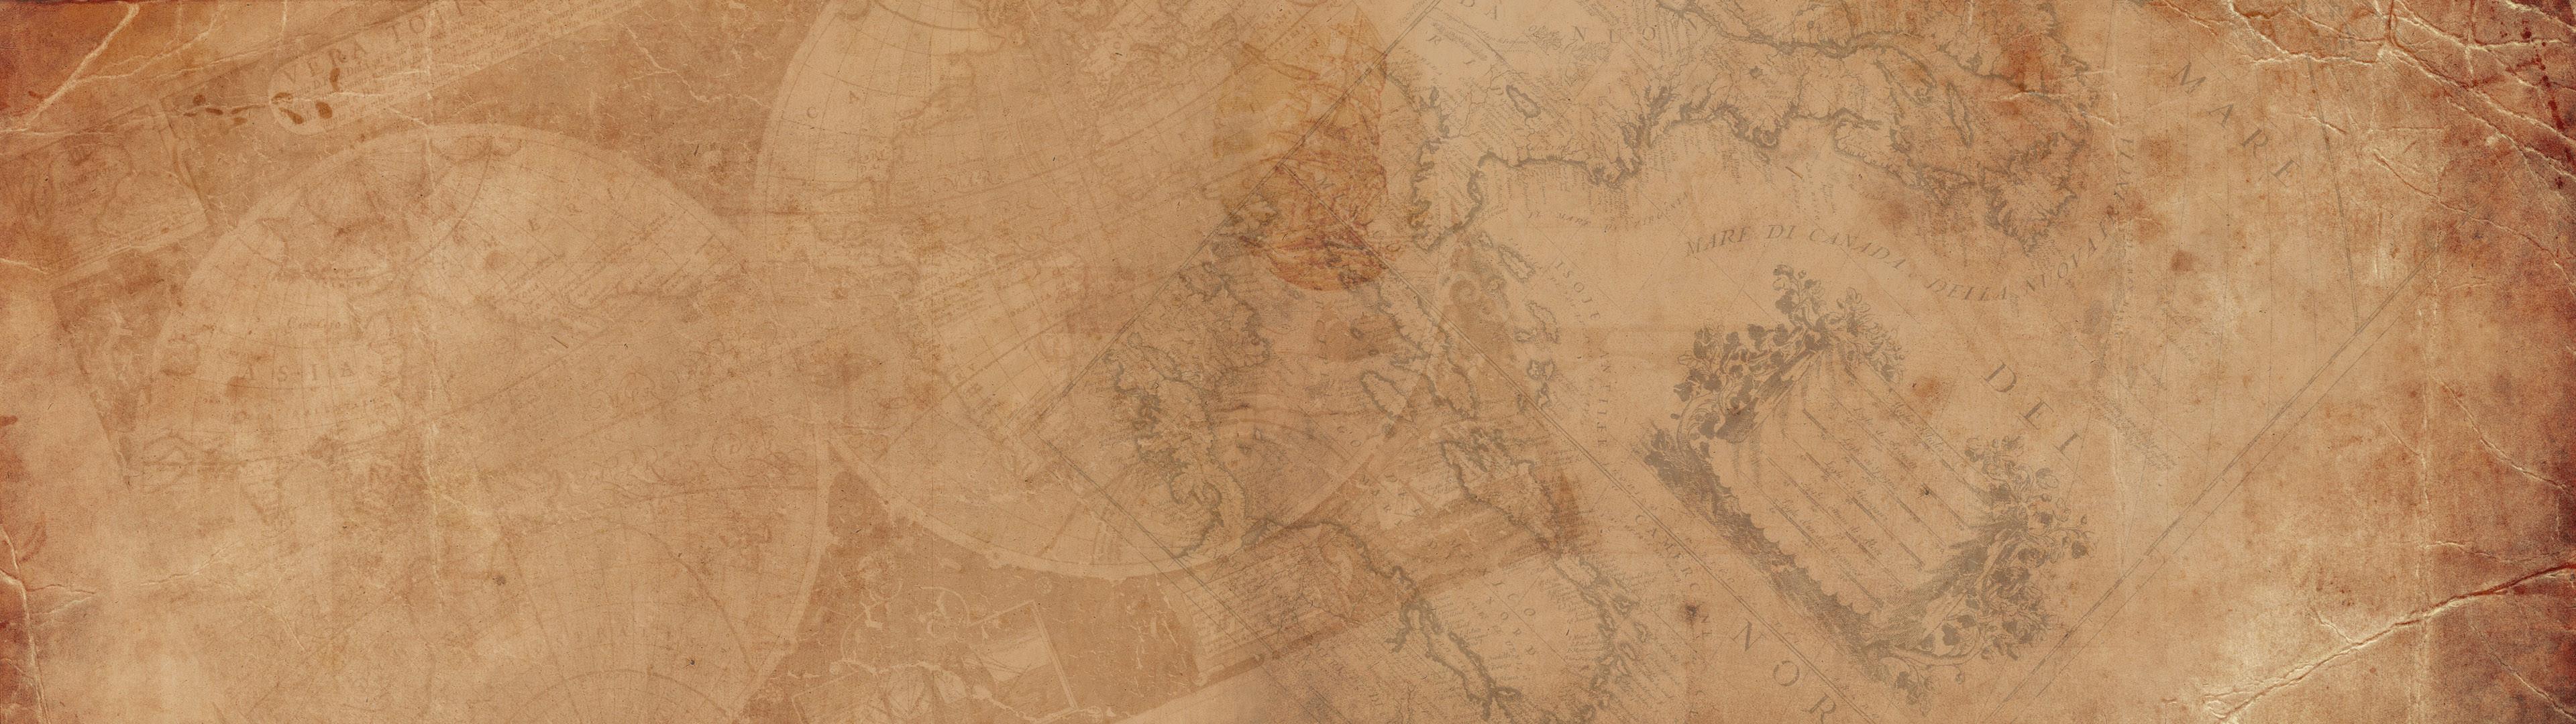 Vintage Map Wallpaper ·① WallpaperTag